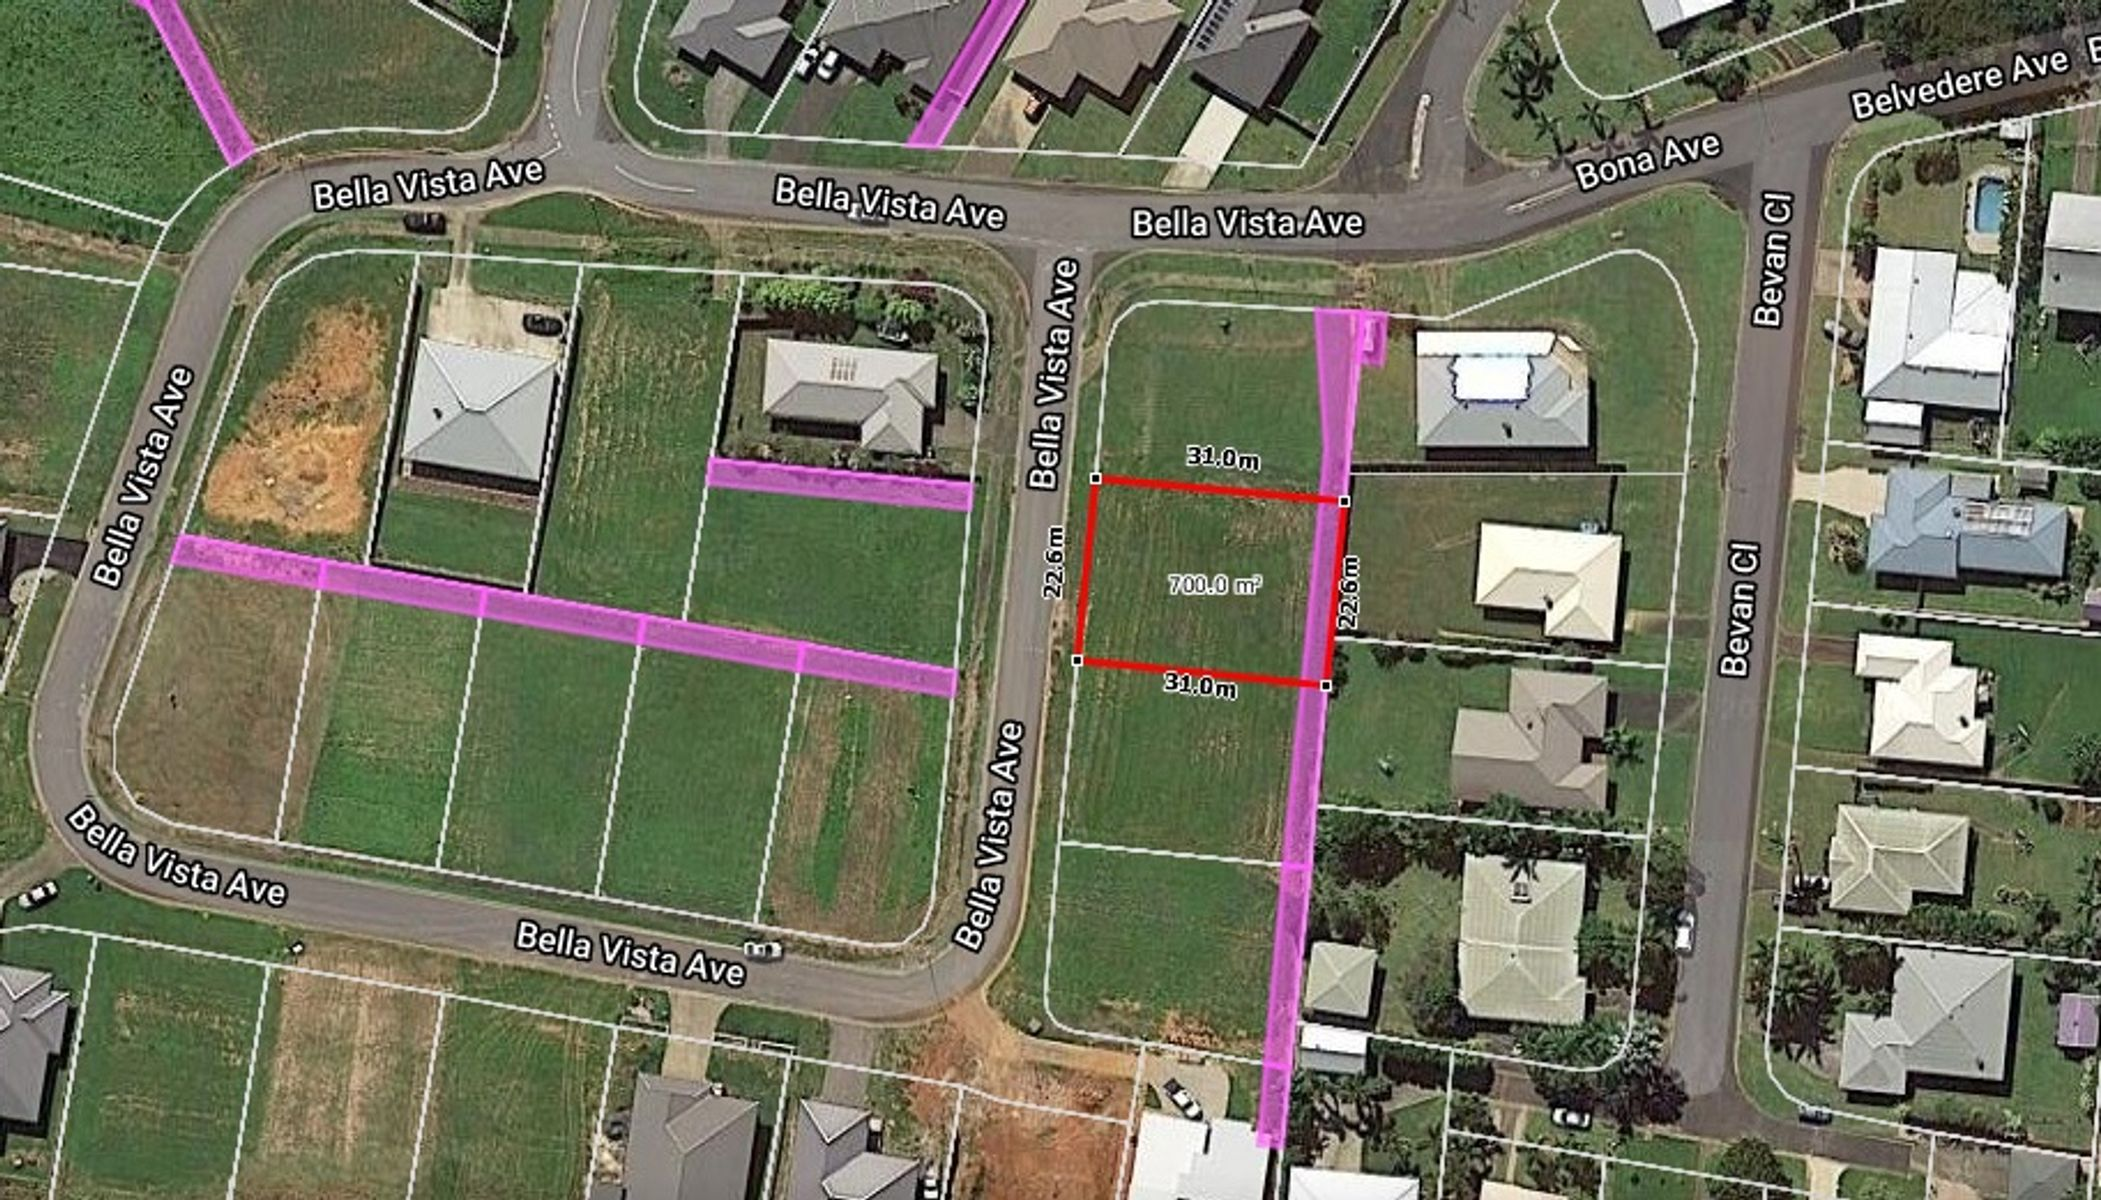 65  Belvedere Avenue, Belvedere, QLD 4860